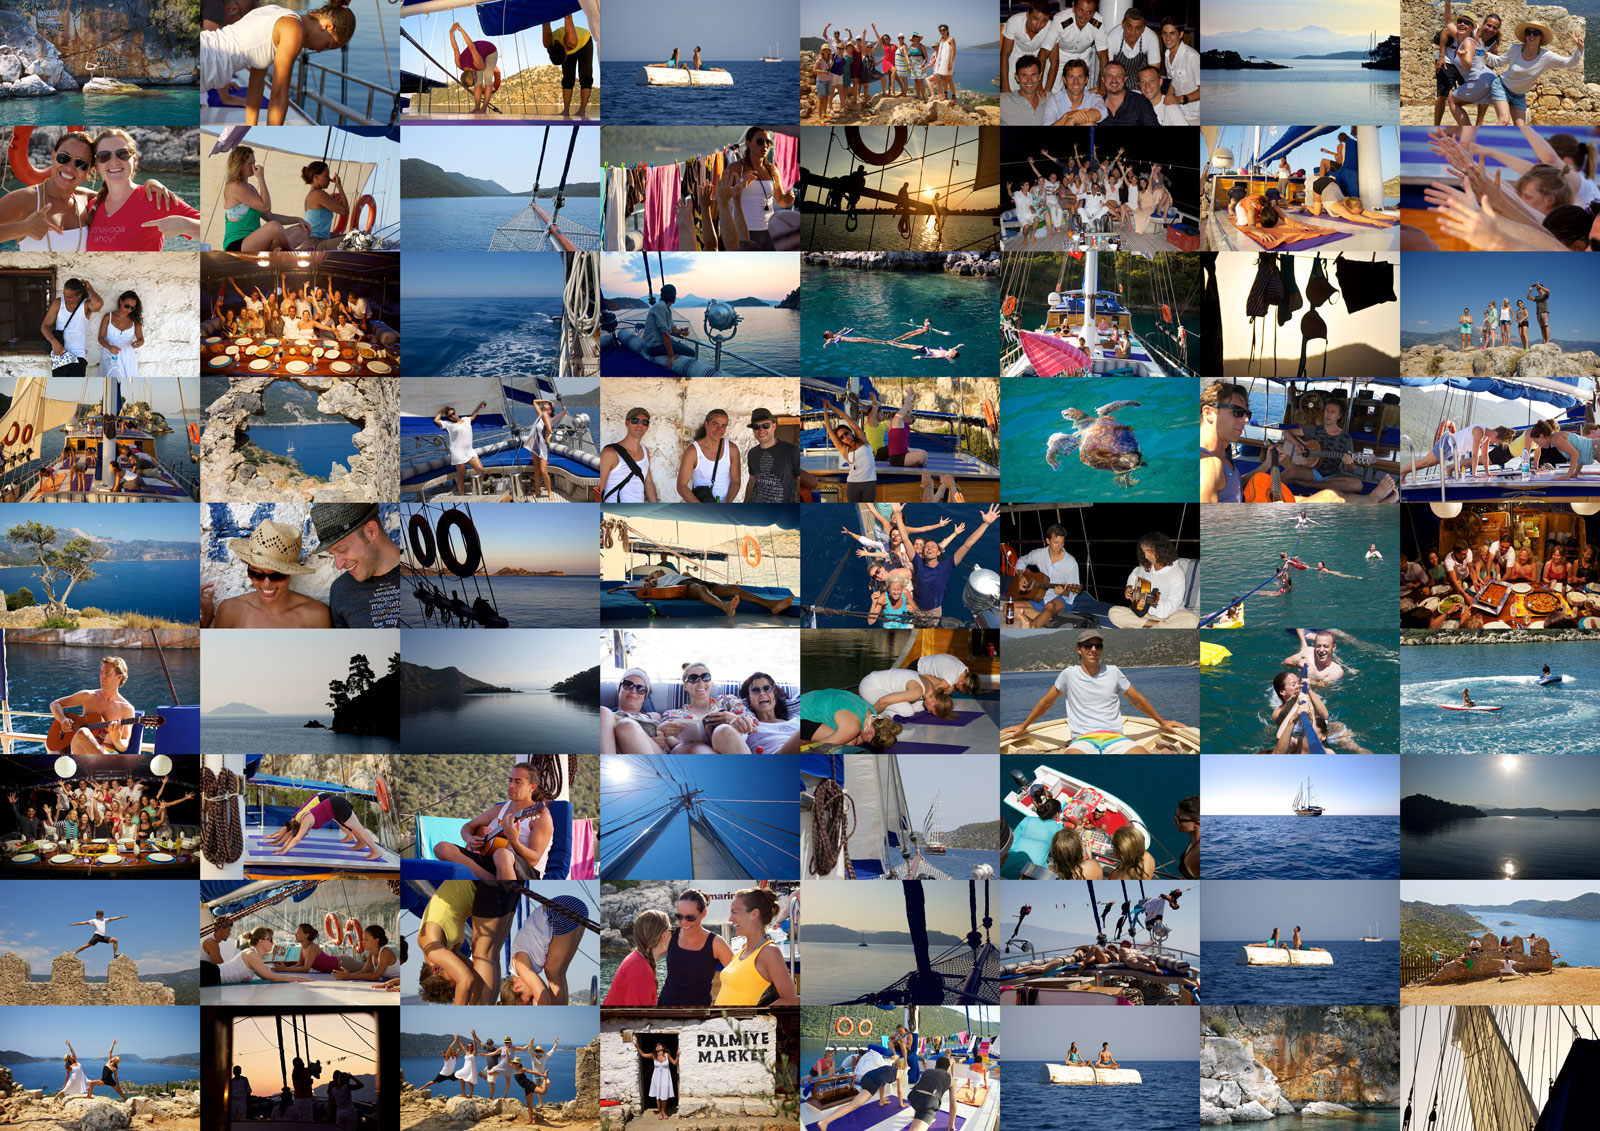 Yoga Cruise | Samstag, 25. Juni – Samstag, 2. Juli 2016